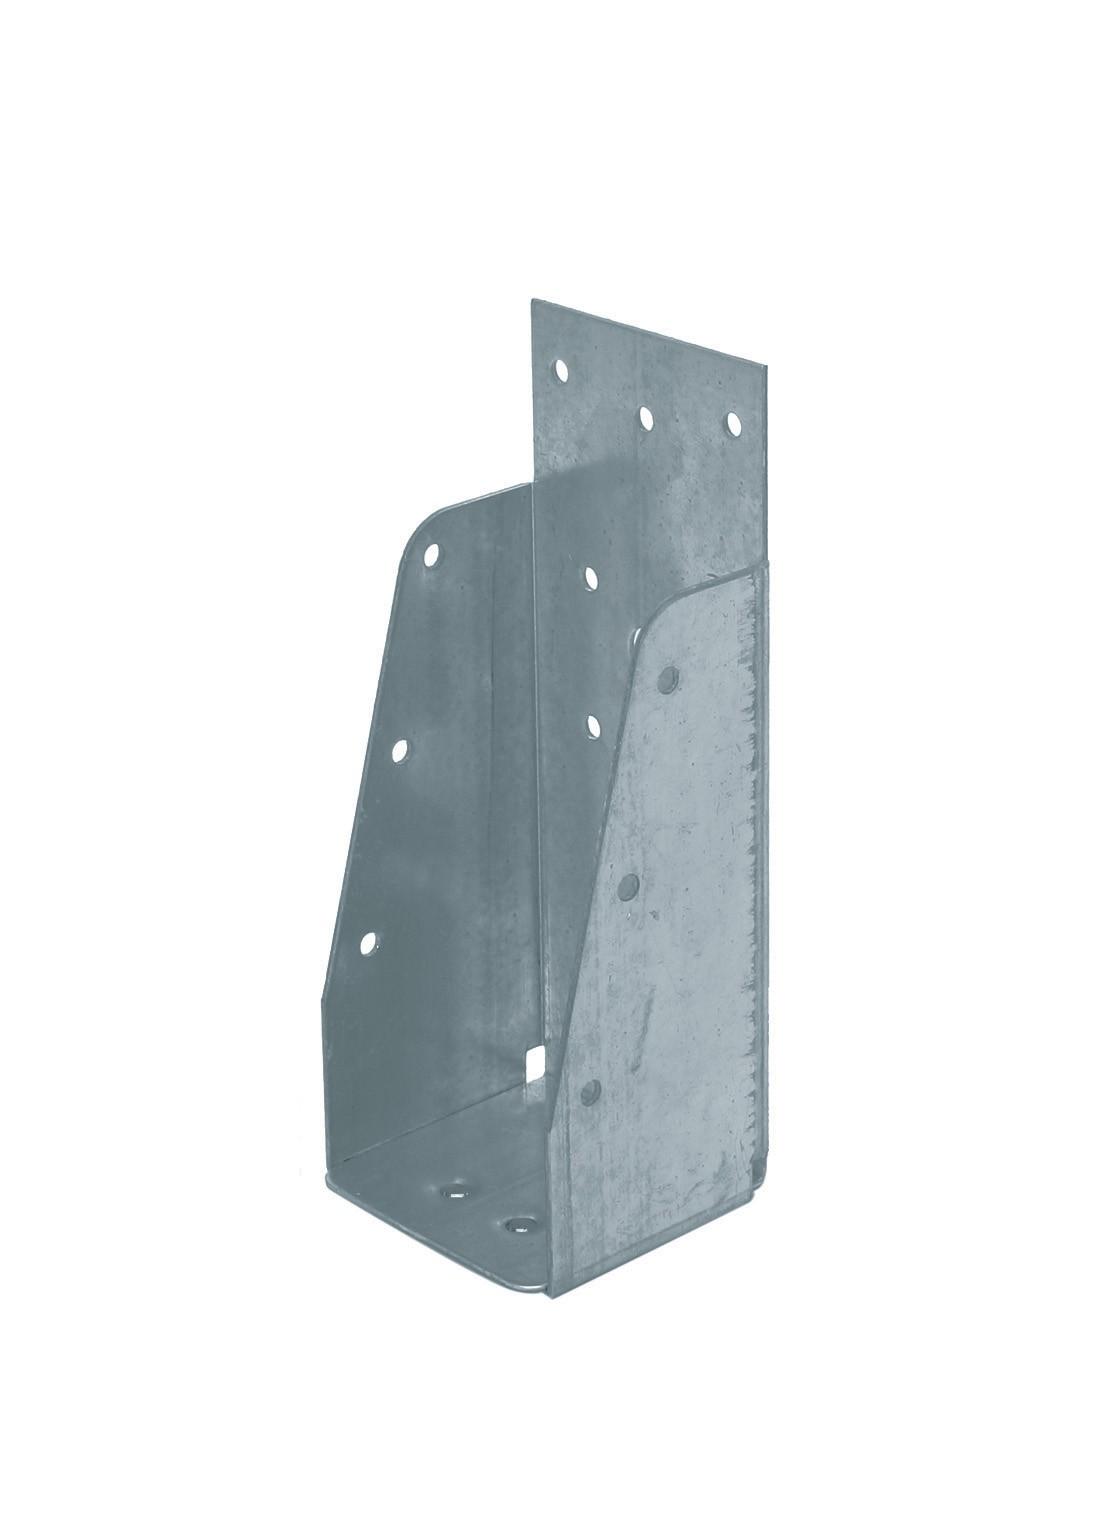 Balkdrager GBS-ZL 75x225 1,5 SV